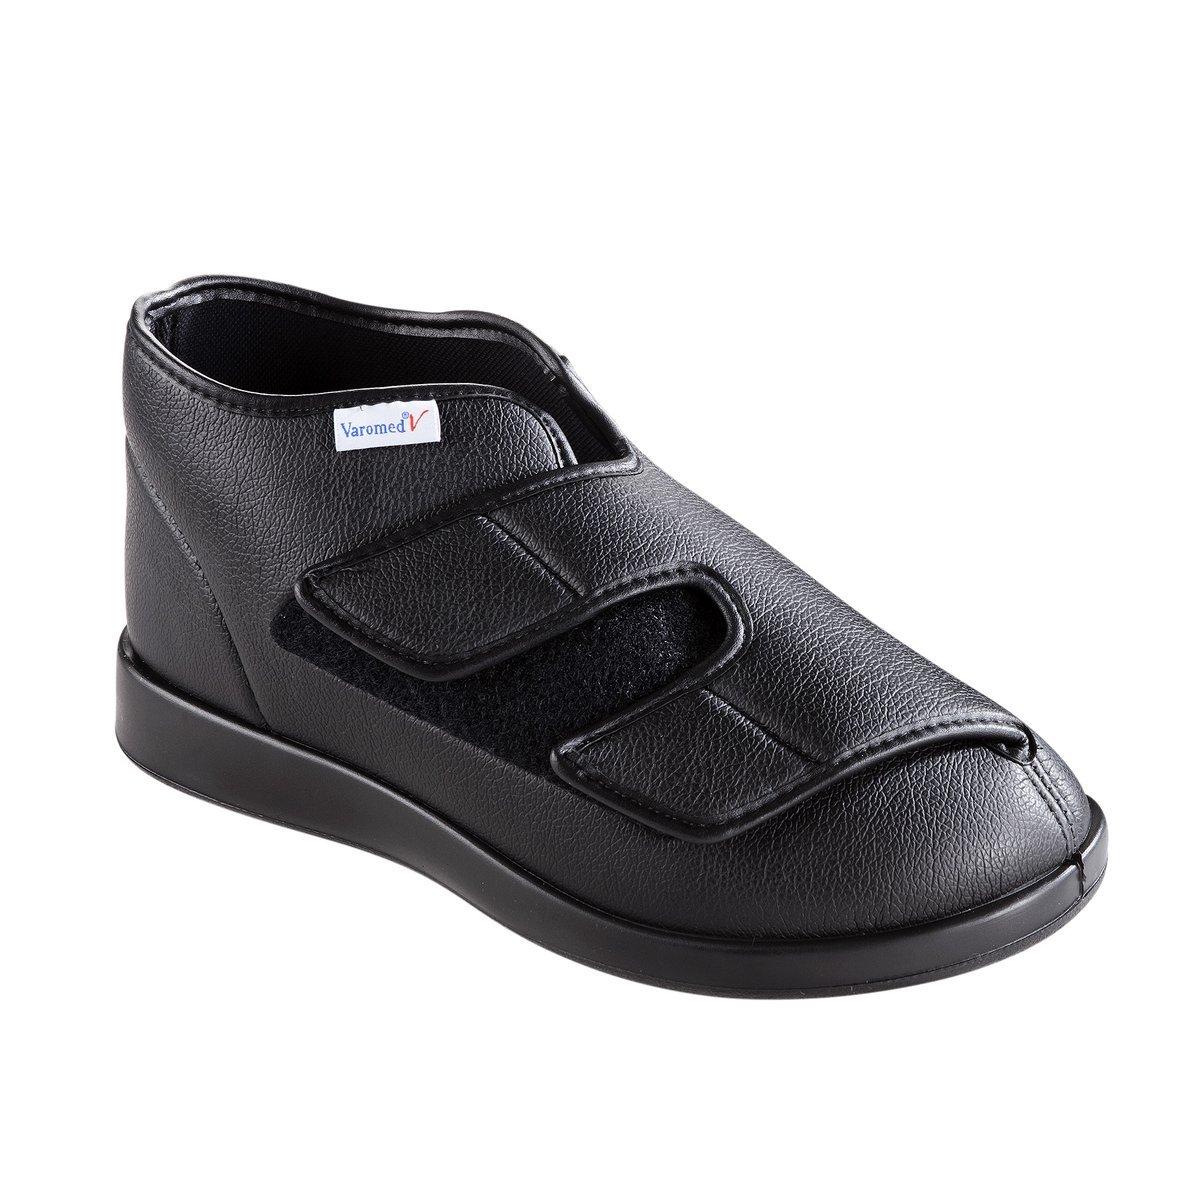 Varomed - Zapatillas para mujer 38 EU|negro - negro